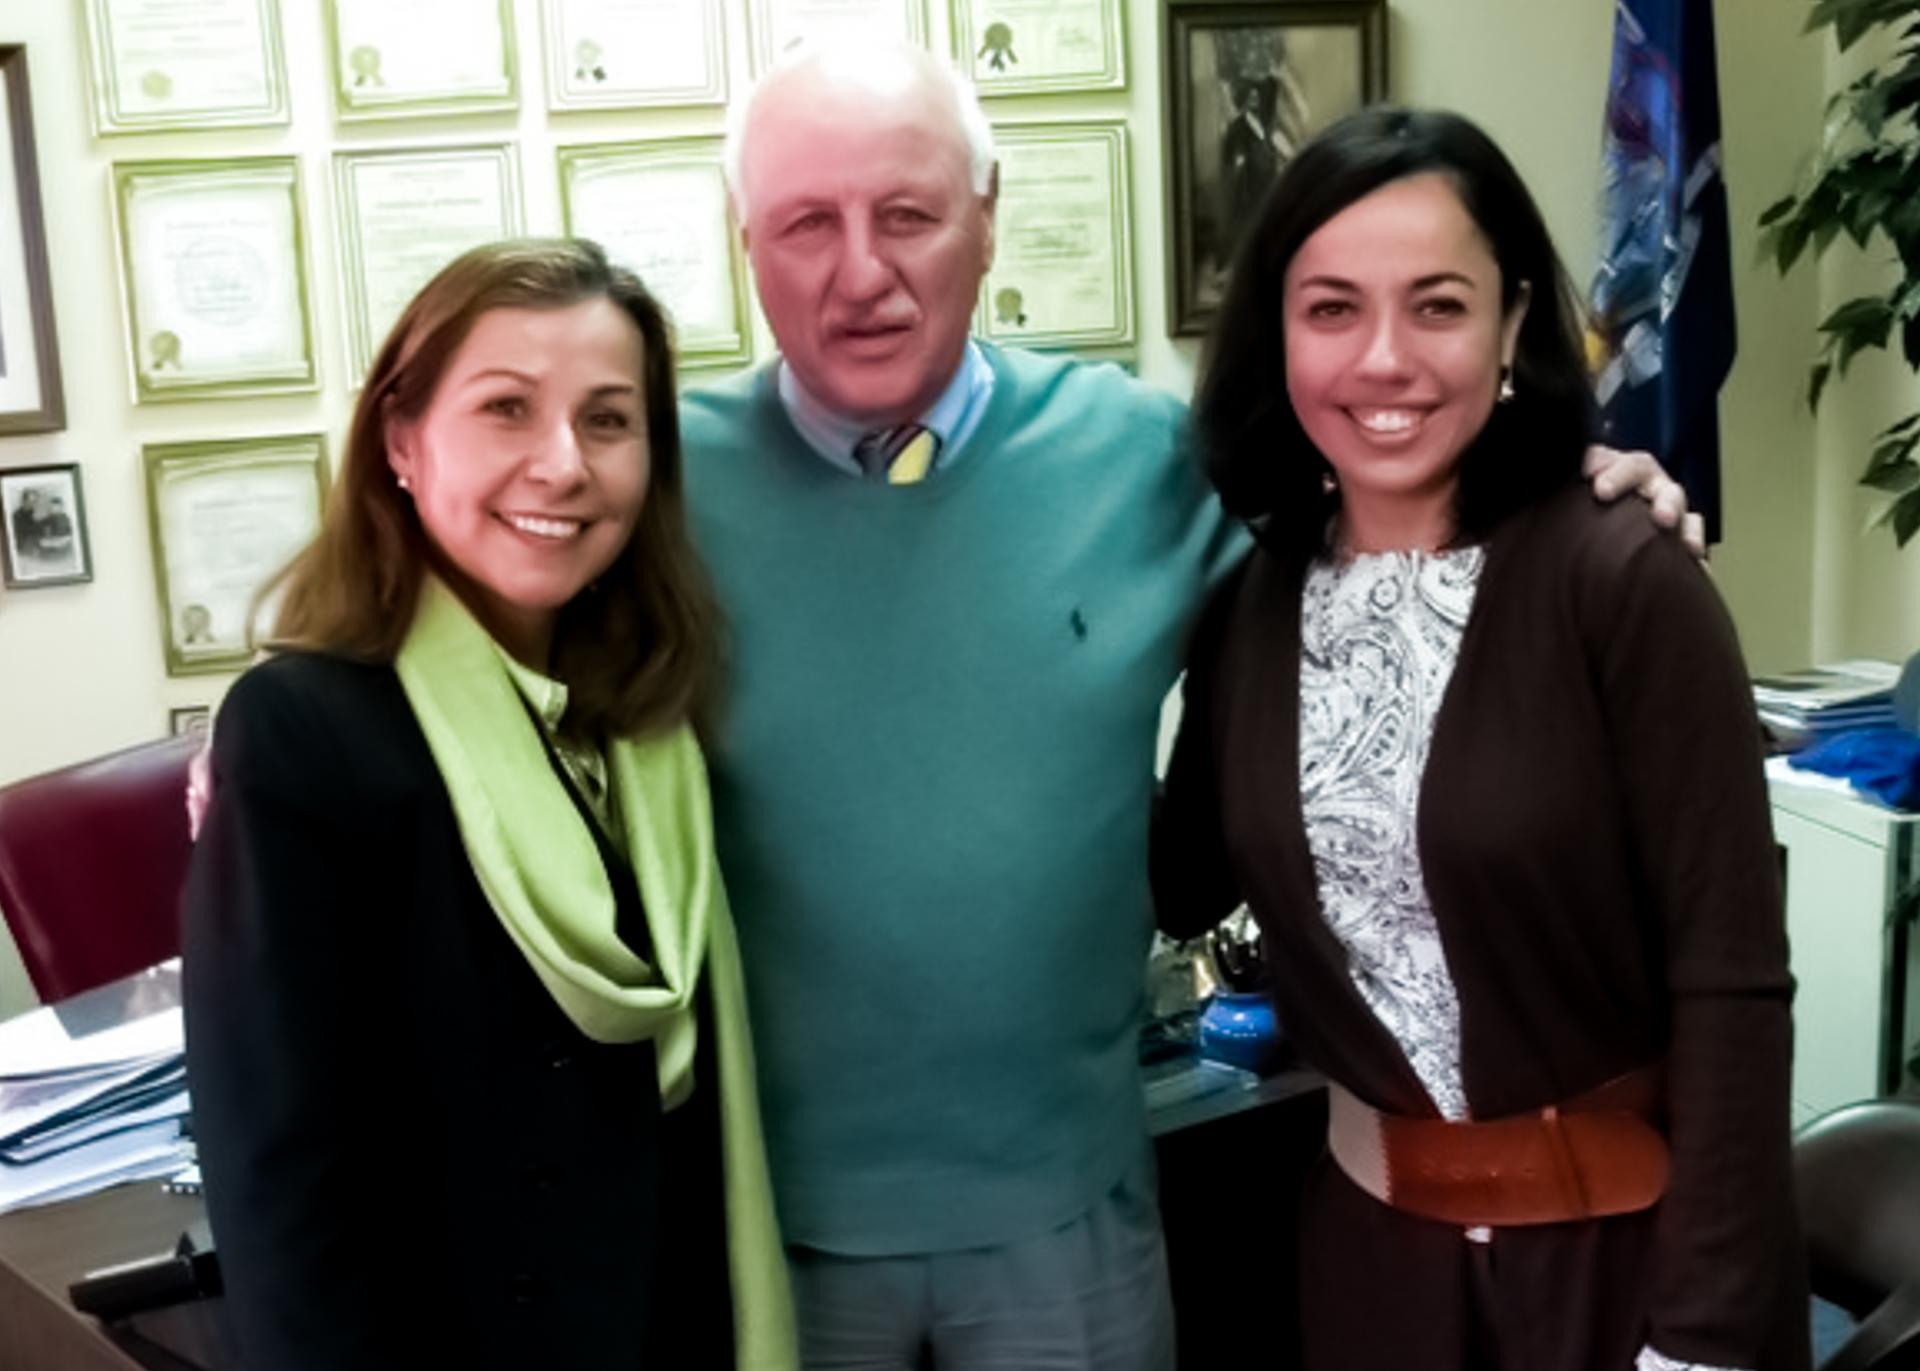 Isabel Sepulveda (President of OLA of Eastern Long Island), Senator K LaValle and Veronica Abreu (Computer teacher in OLA of Eastern Long Island) — with Clases Verónica.